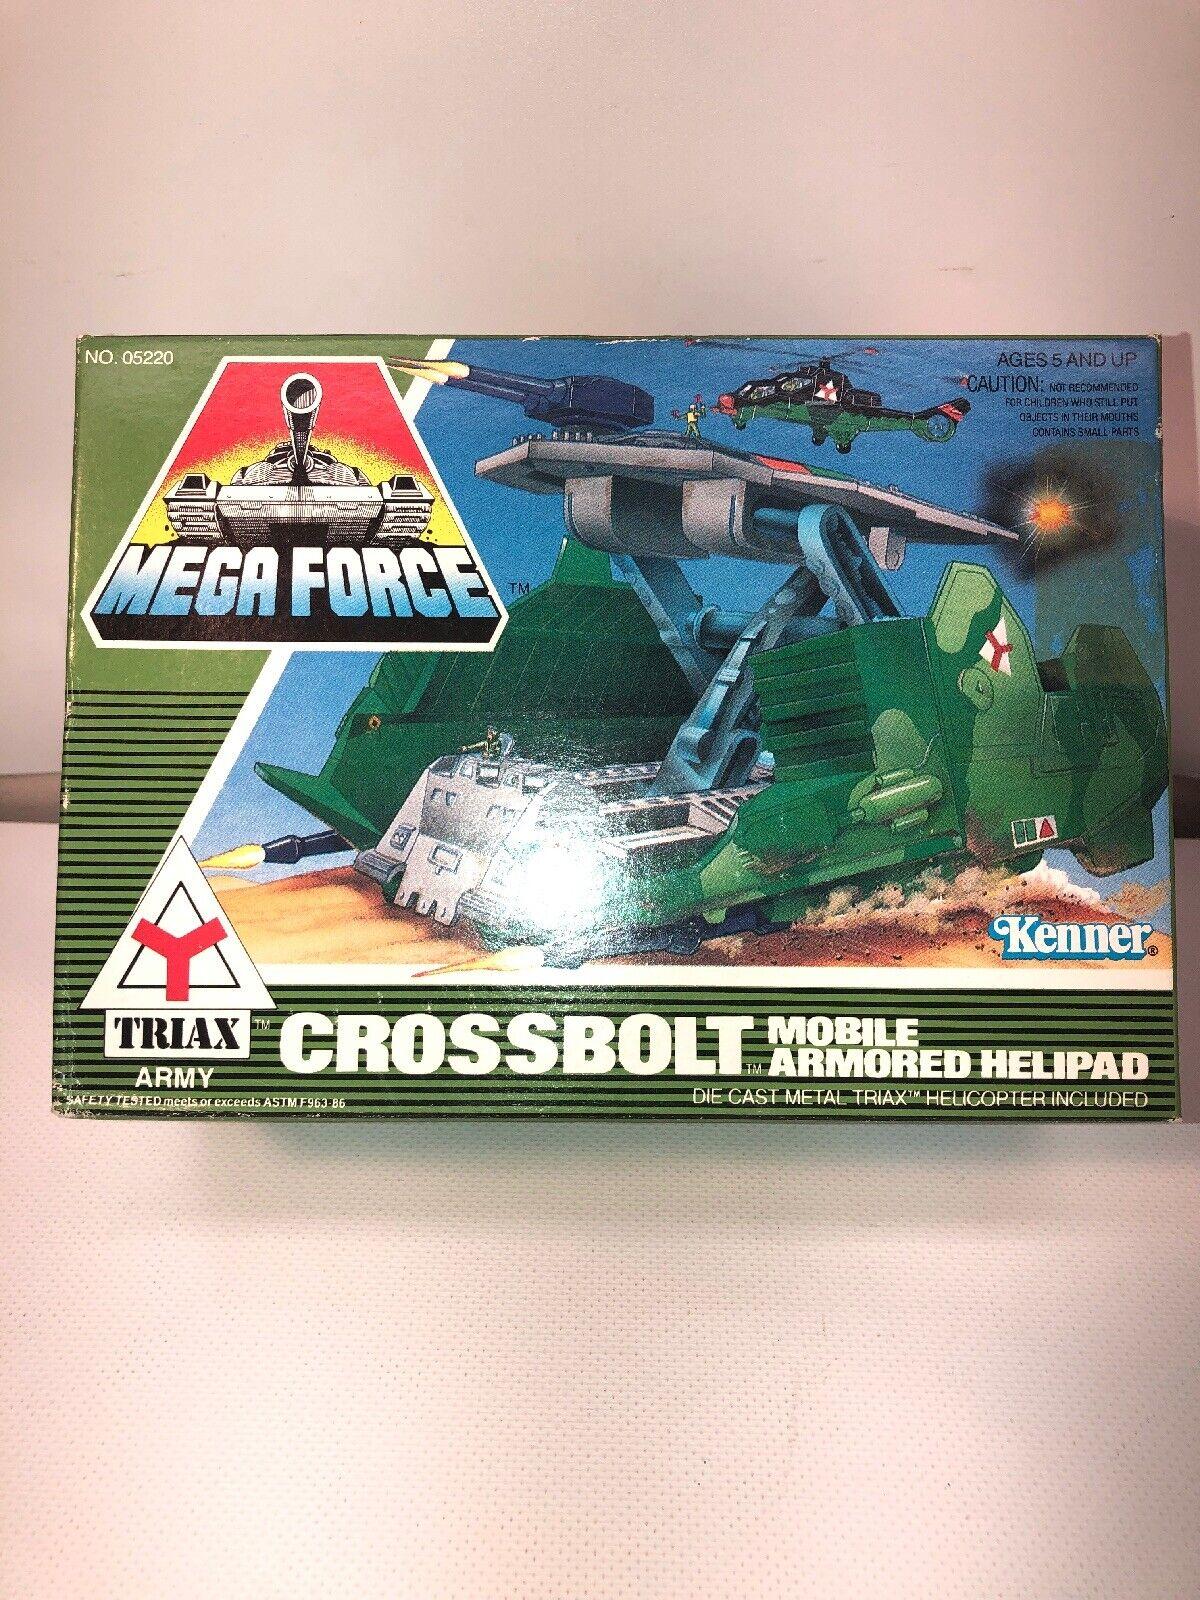 1989 Kenner Mega Force octavo móvil blindado helipuerto Triax Nuevo En Caja